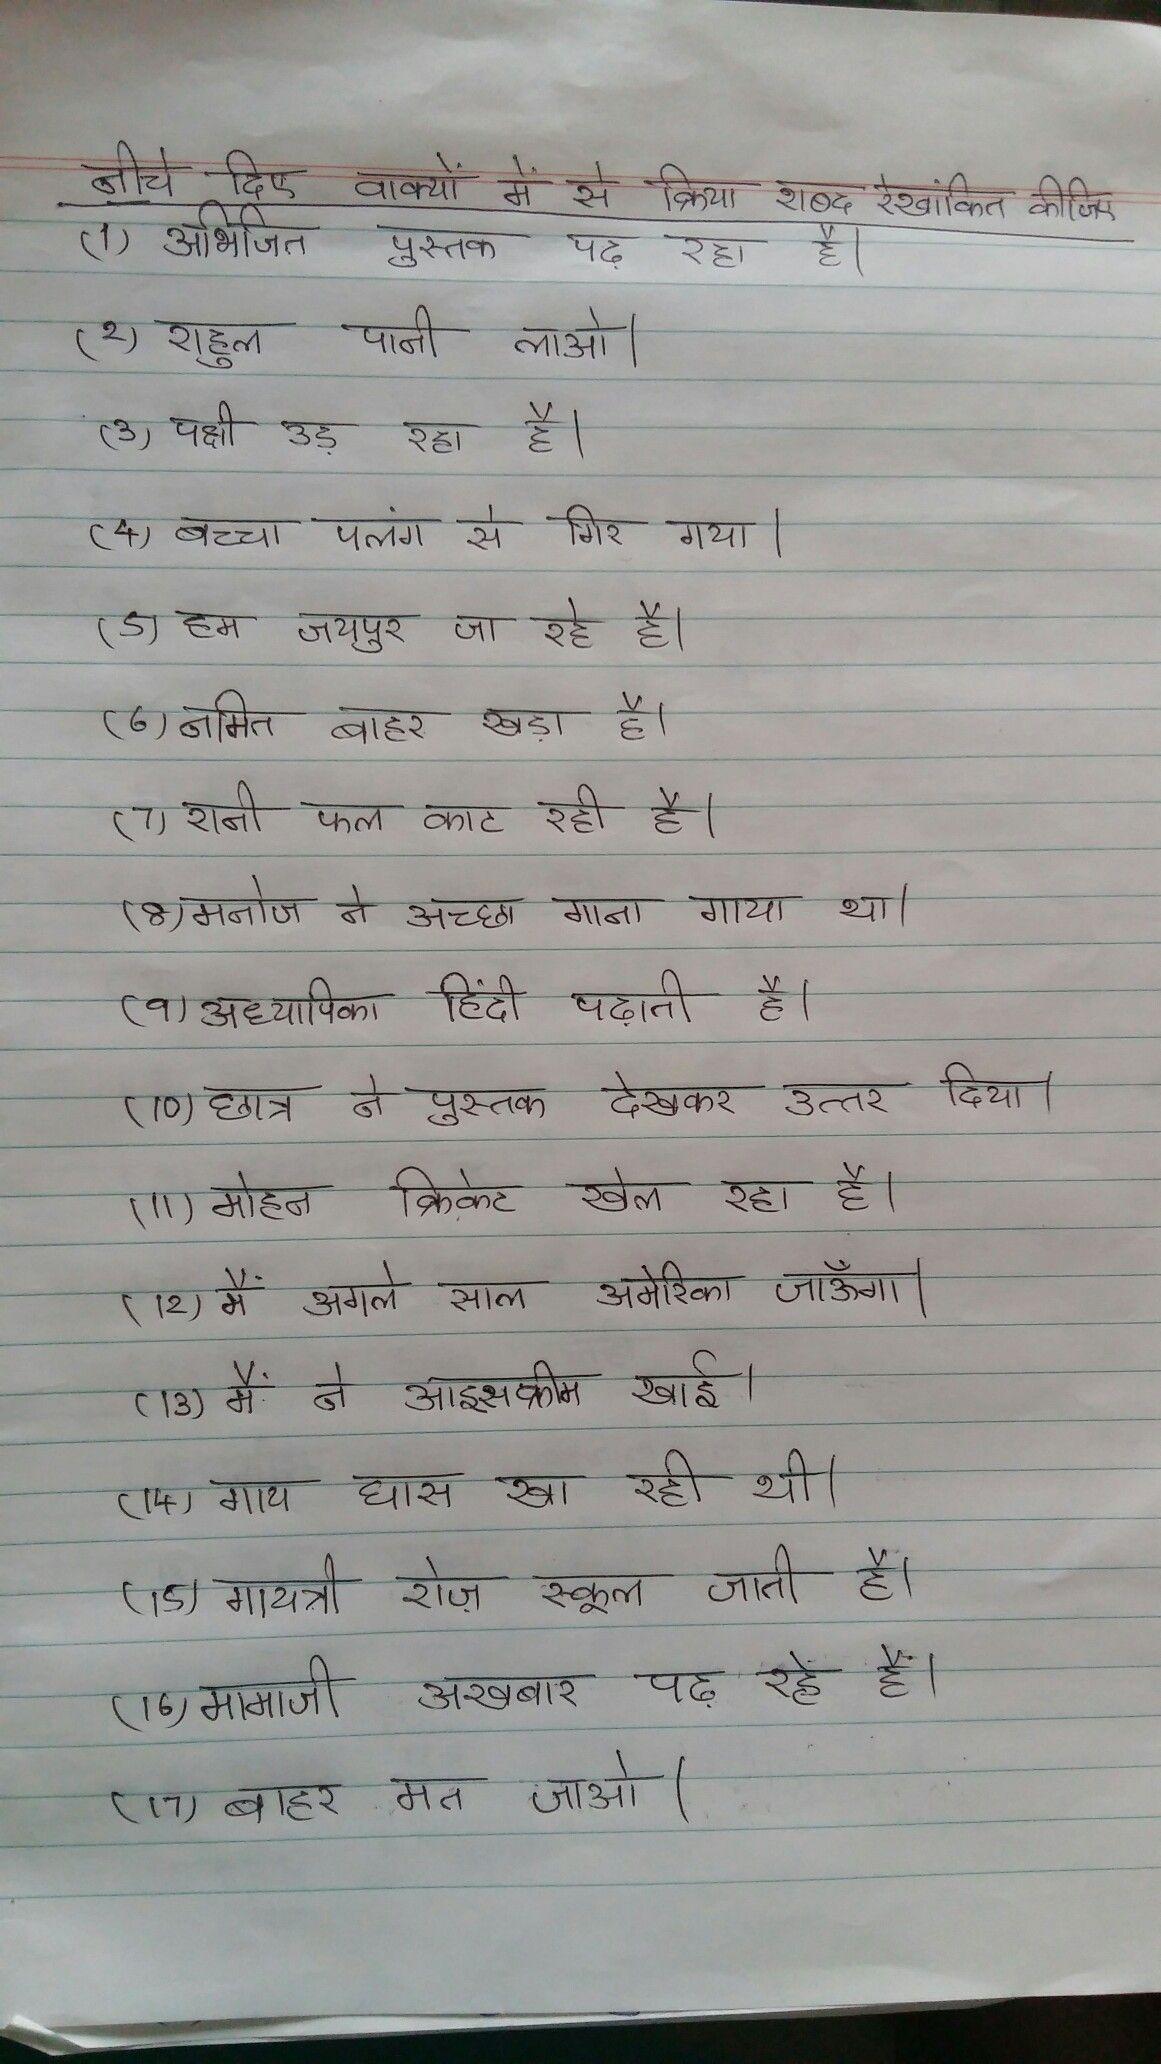 worksheet Hindi Grammar Worksheets For Class 8 Cbse kriya worksheet hindi grammar worksheets for school kids grammar